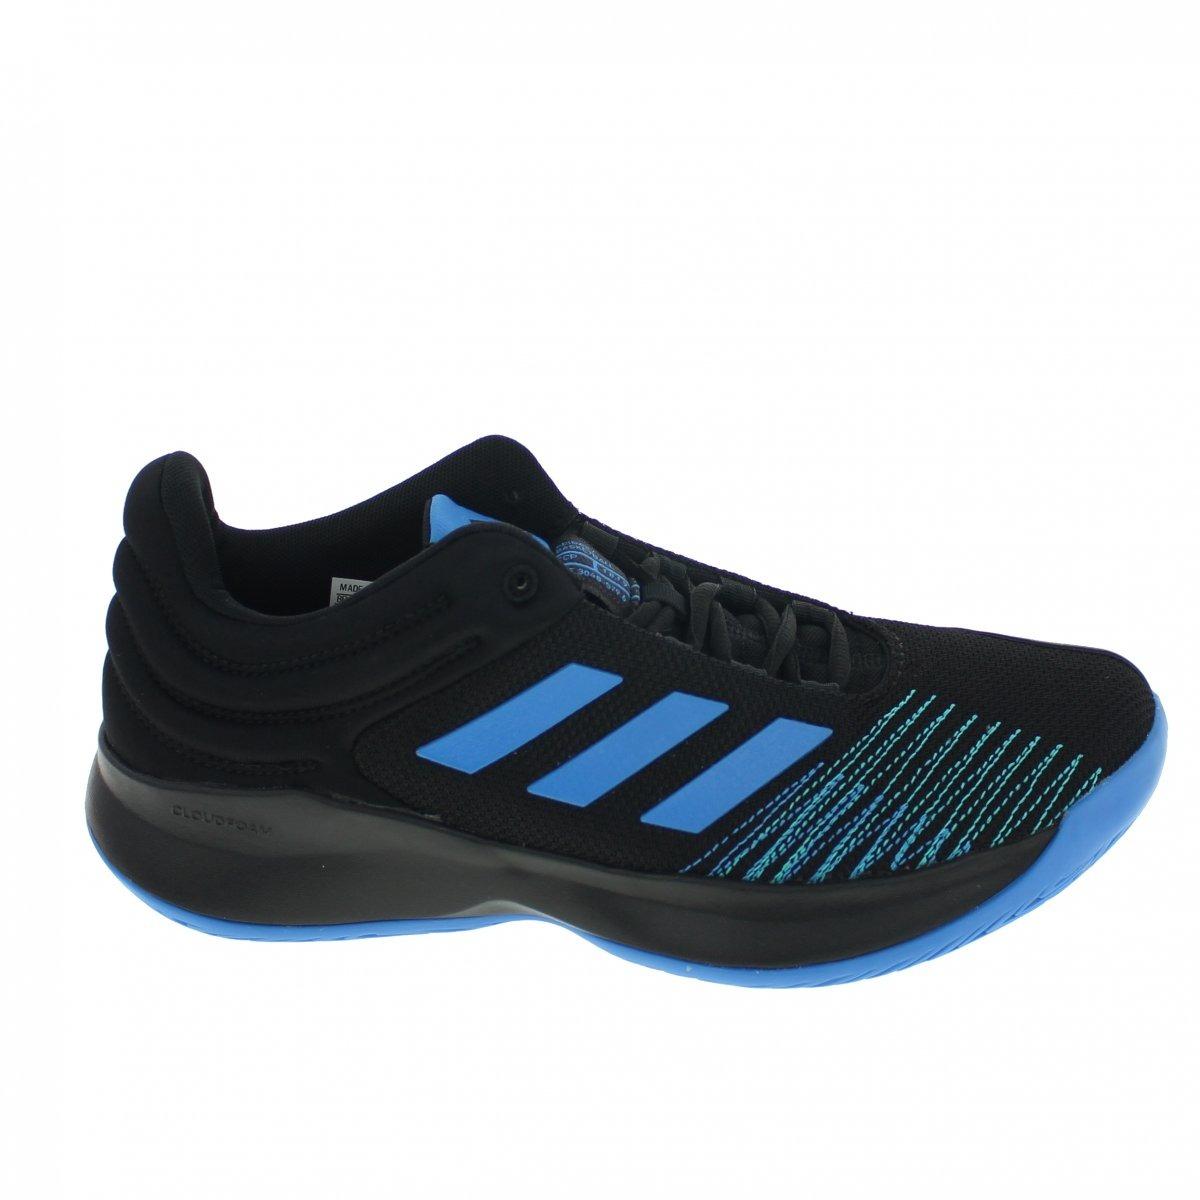 b460b79dee Carregando zoom... masculino basquete adidas. Carregando zoom... tenis  adidas pro spark low masculino basquete original + nf